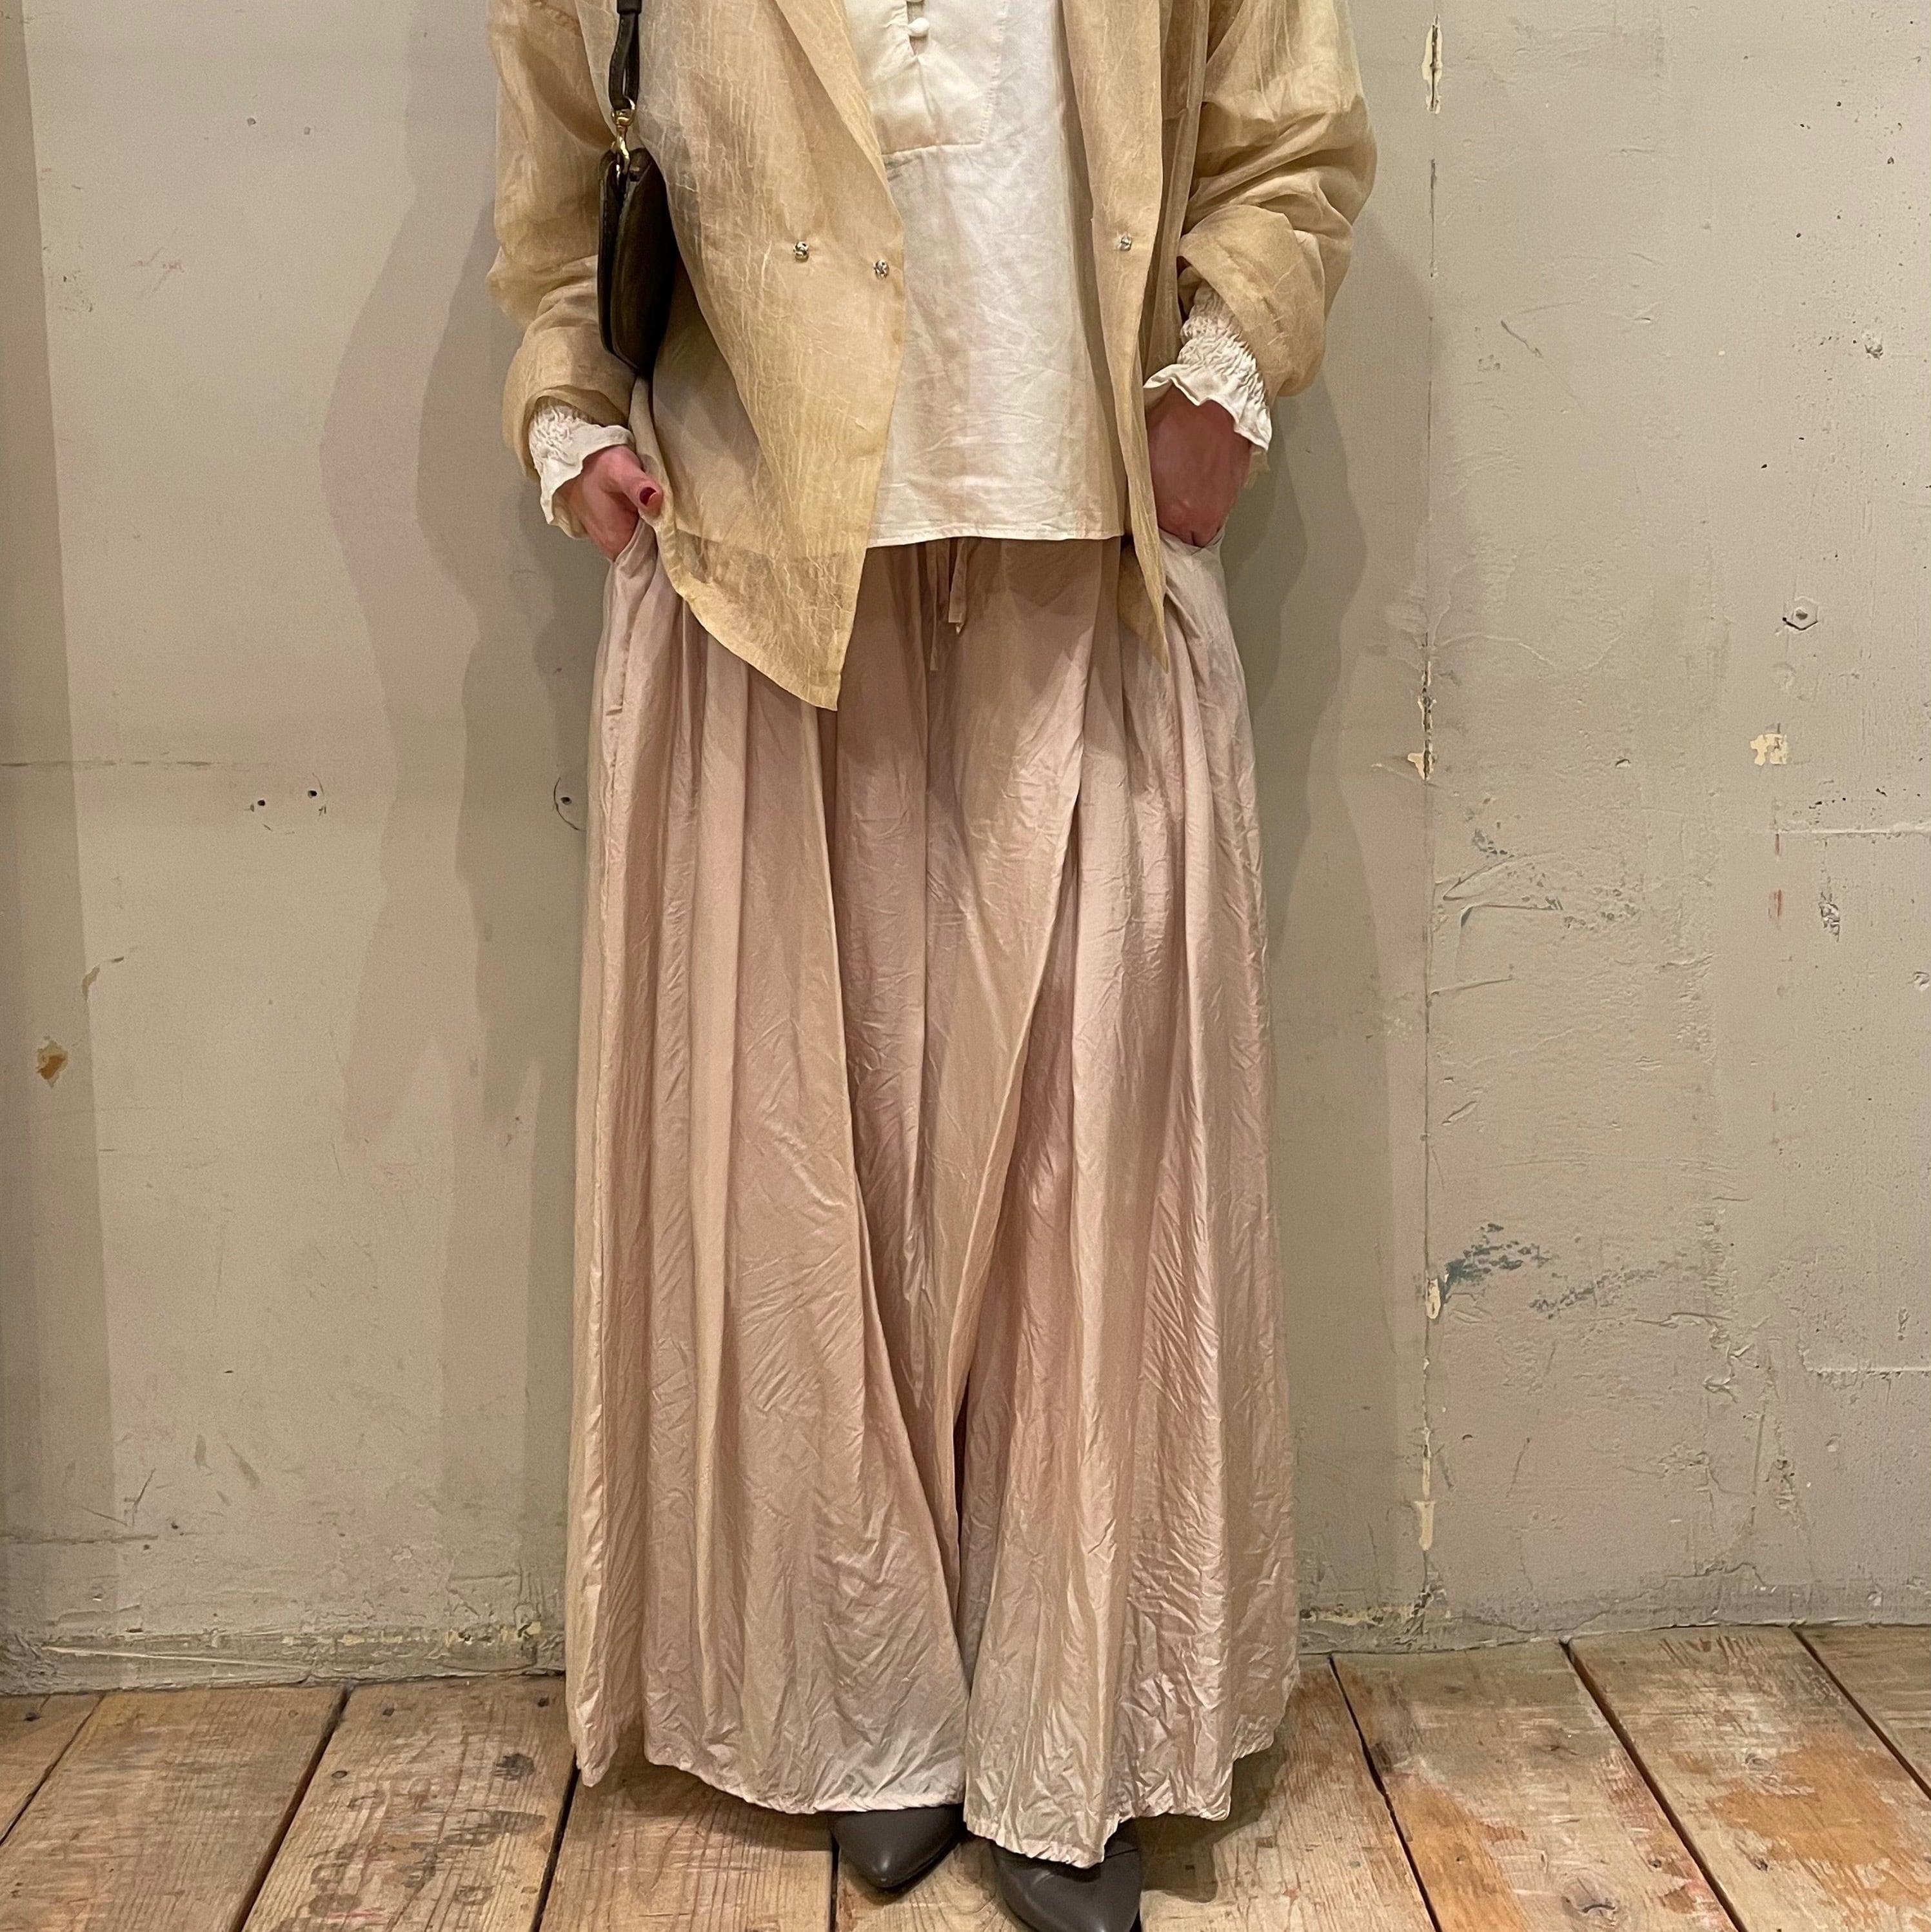 【hippiness × Sakurako.】cupro underpants(pussy willow)/ 【ヒッピネス × サクラコ.】キュプラ アンダーパンツ( 猫柳 )